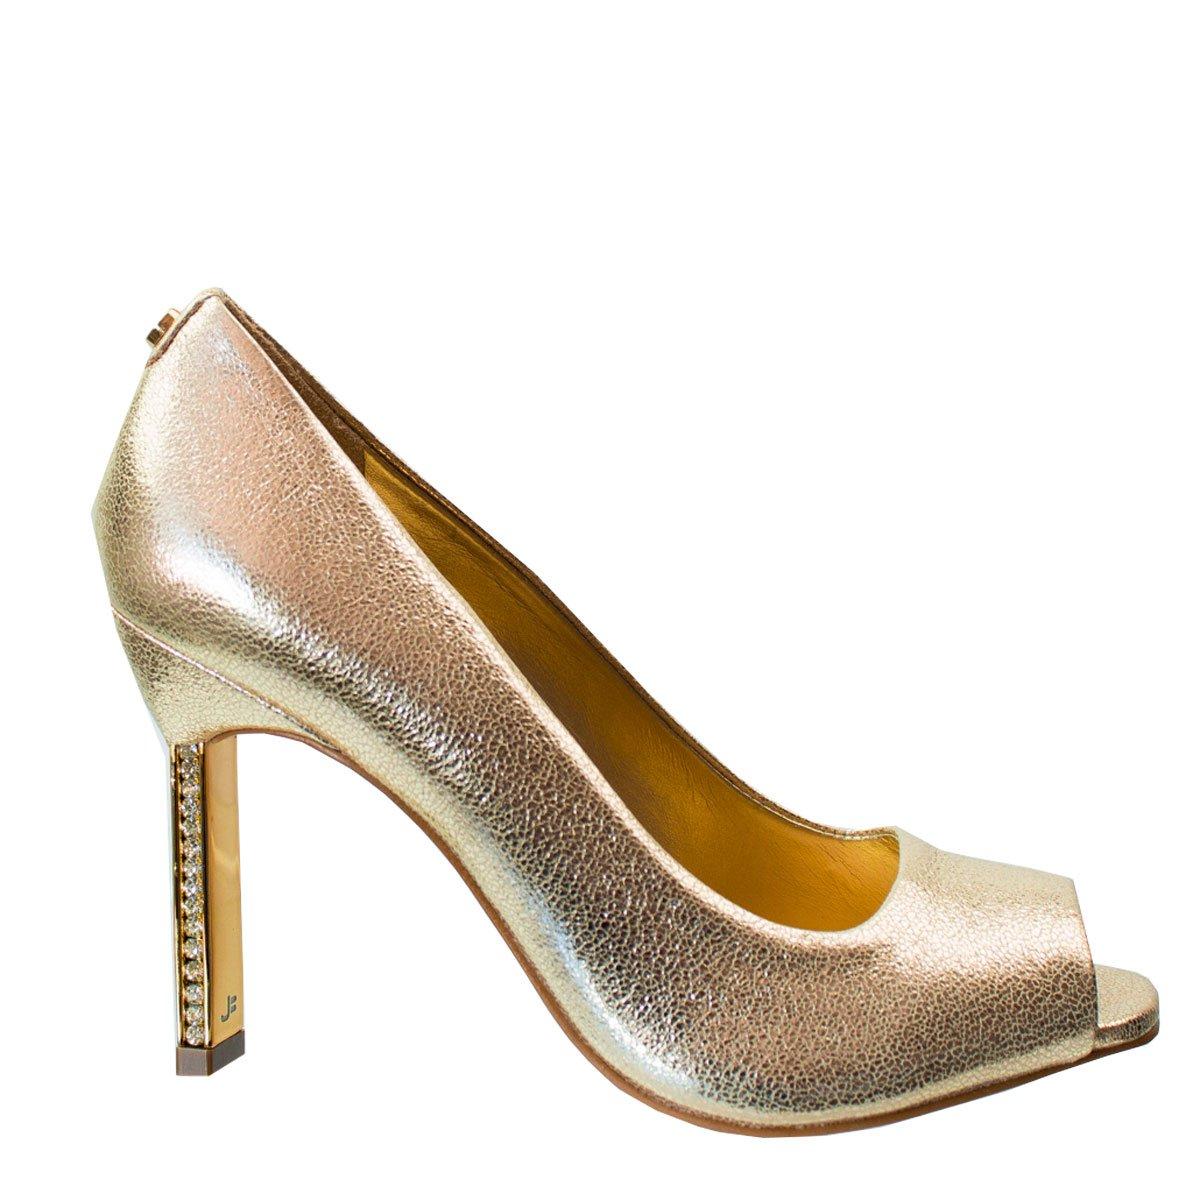 e6cd6ce80b Bizz Store - Sapato Peep Toe Feminino Jorge Bischoff Strass